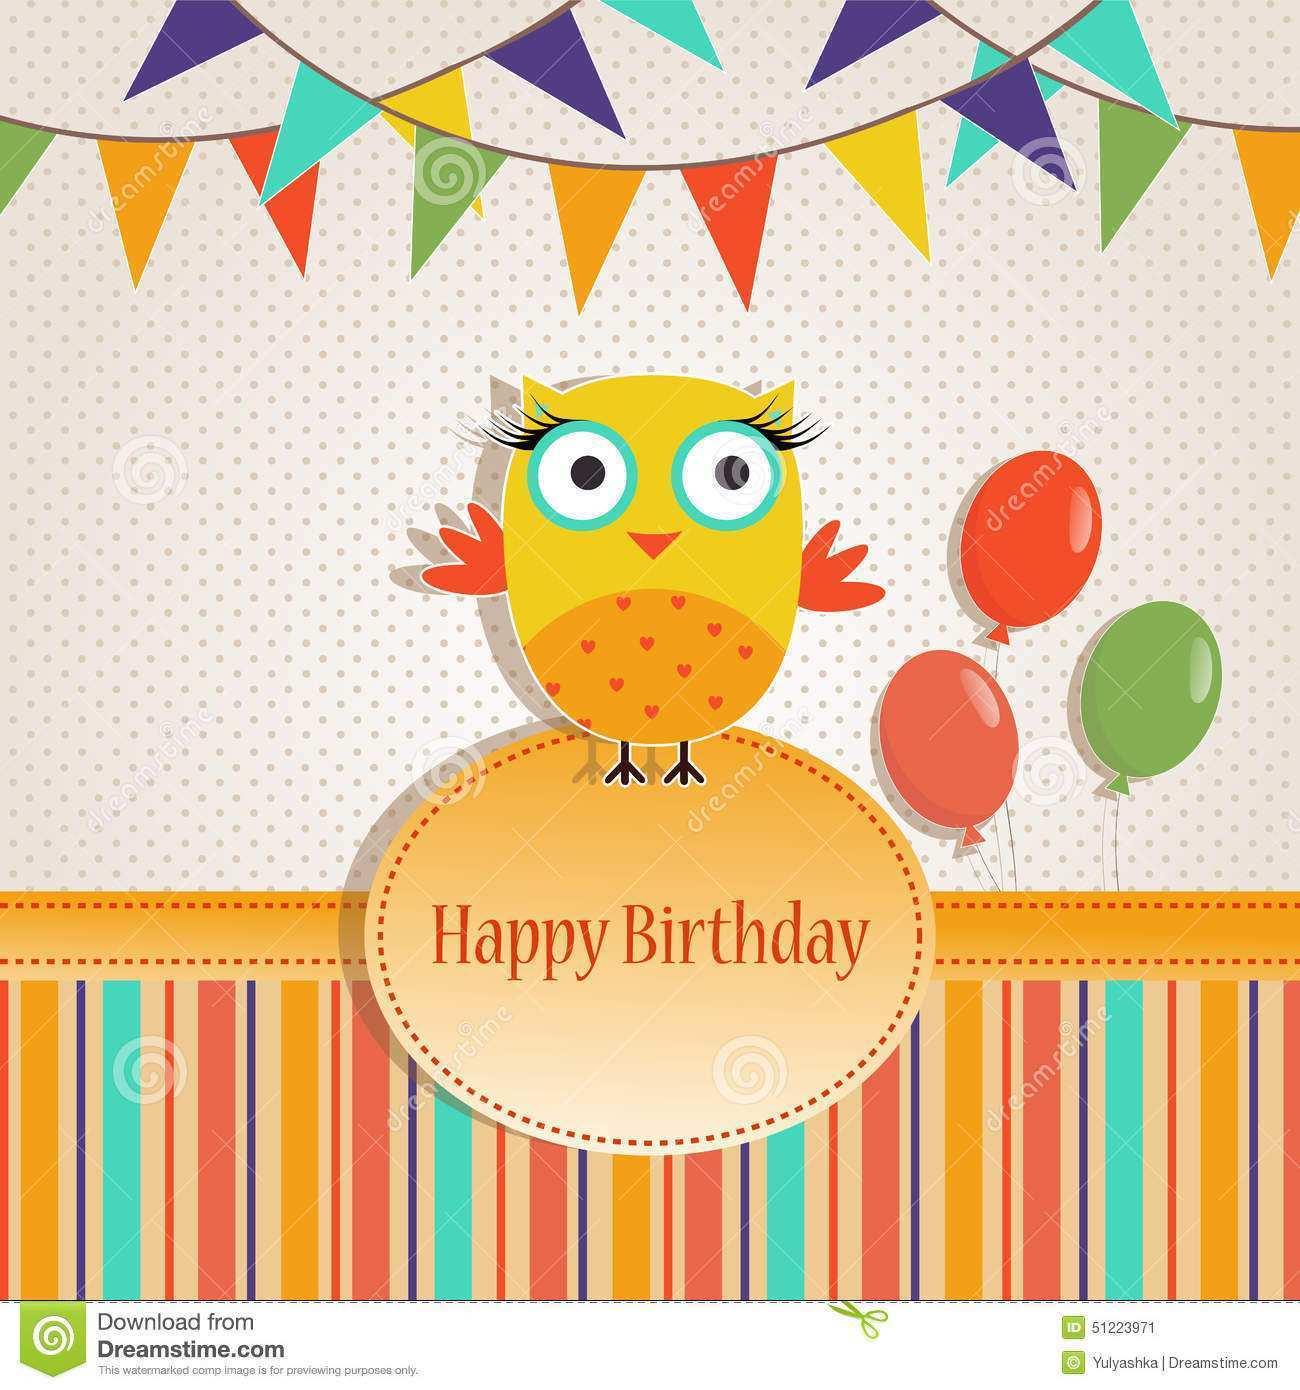 Birthday Card Template Adobe Illustrator Cards Design Templates